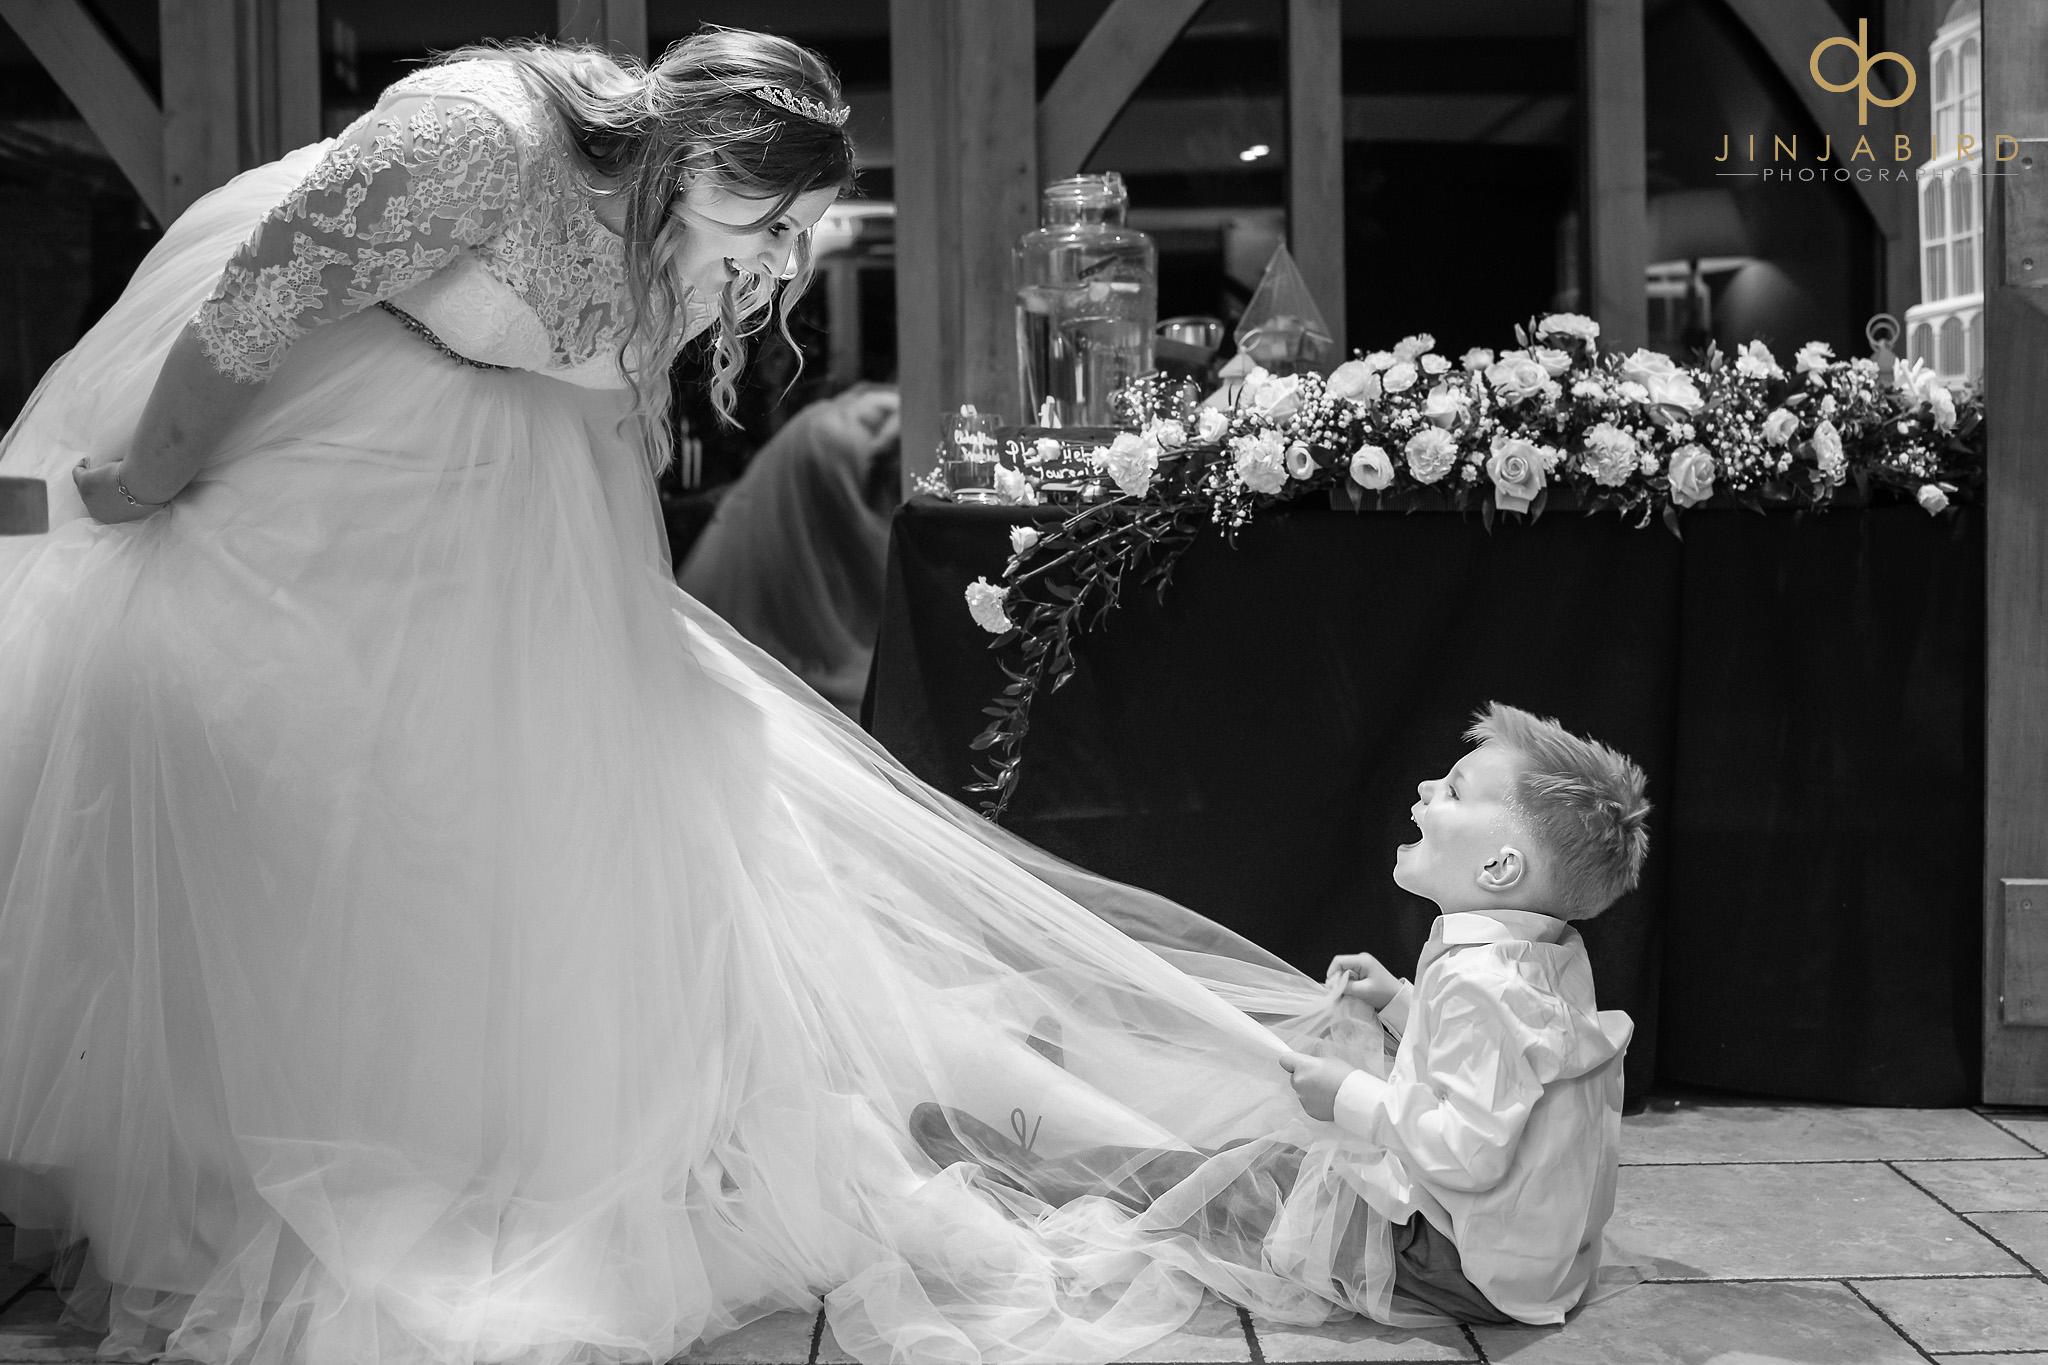 small boy on brides dress